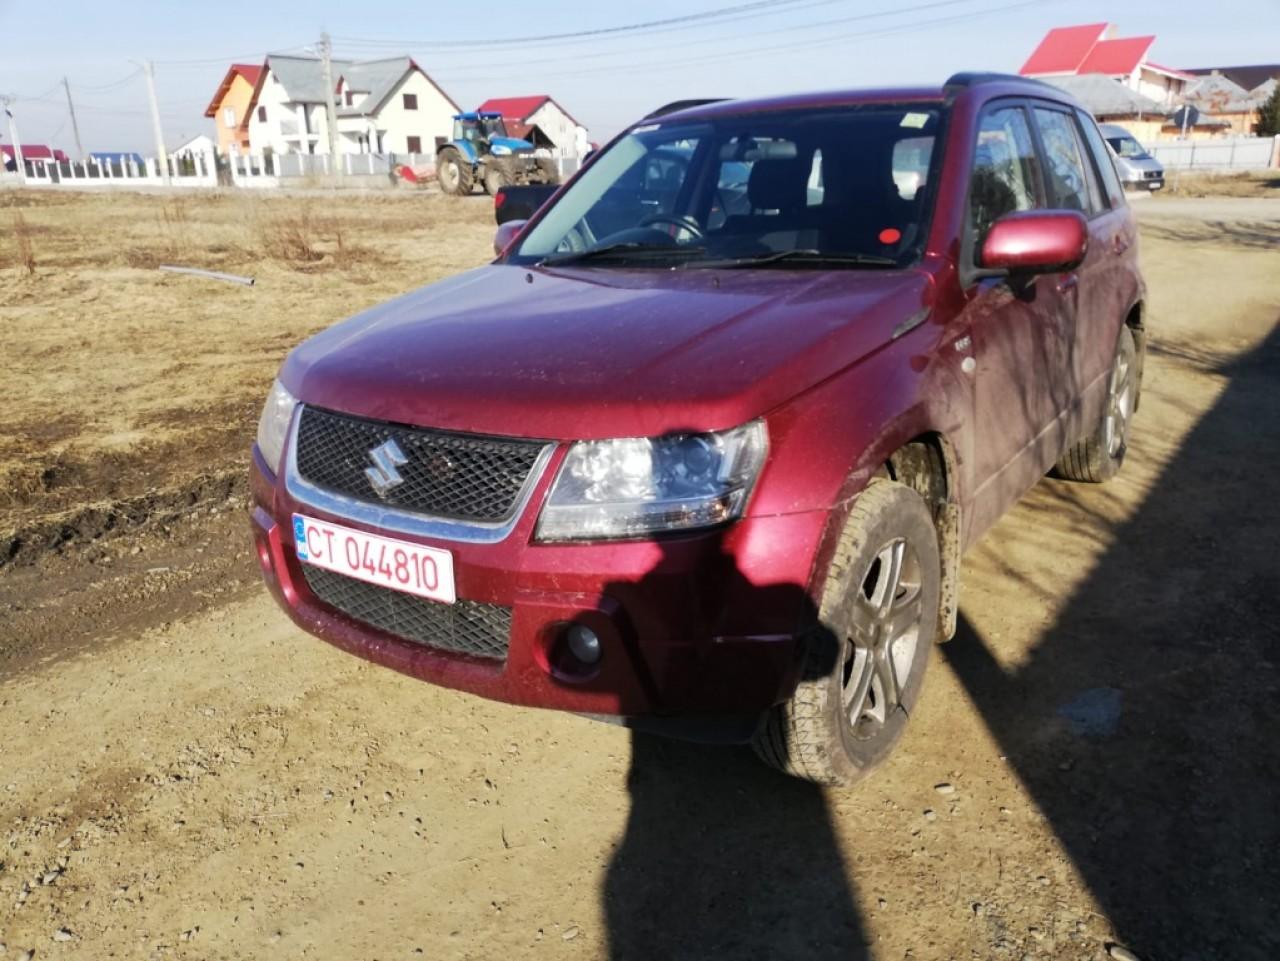 Ax came Suzuki Grand Vitara 2006 SUV 1.9DDiS F9Q